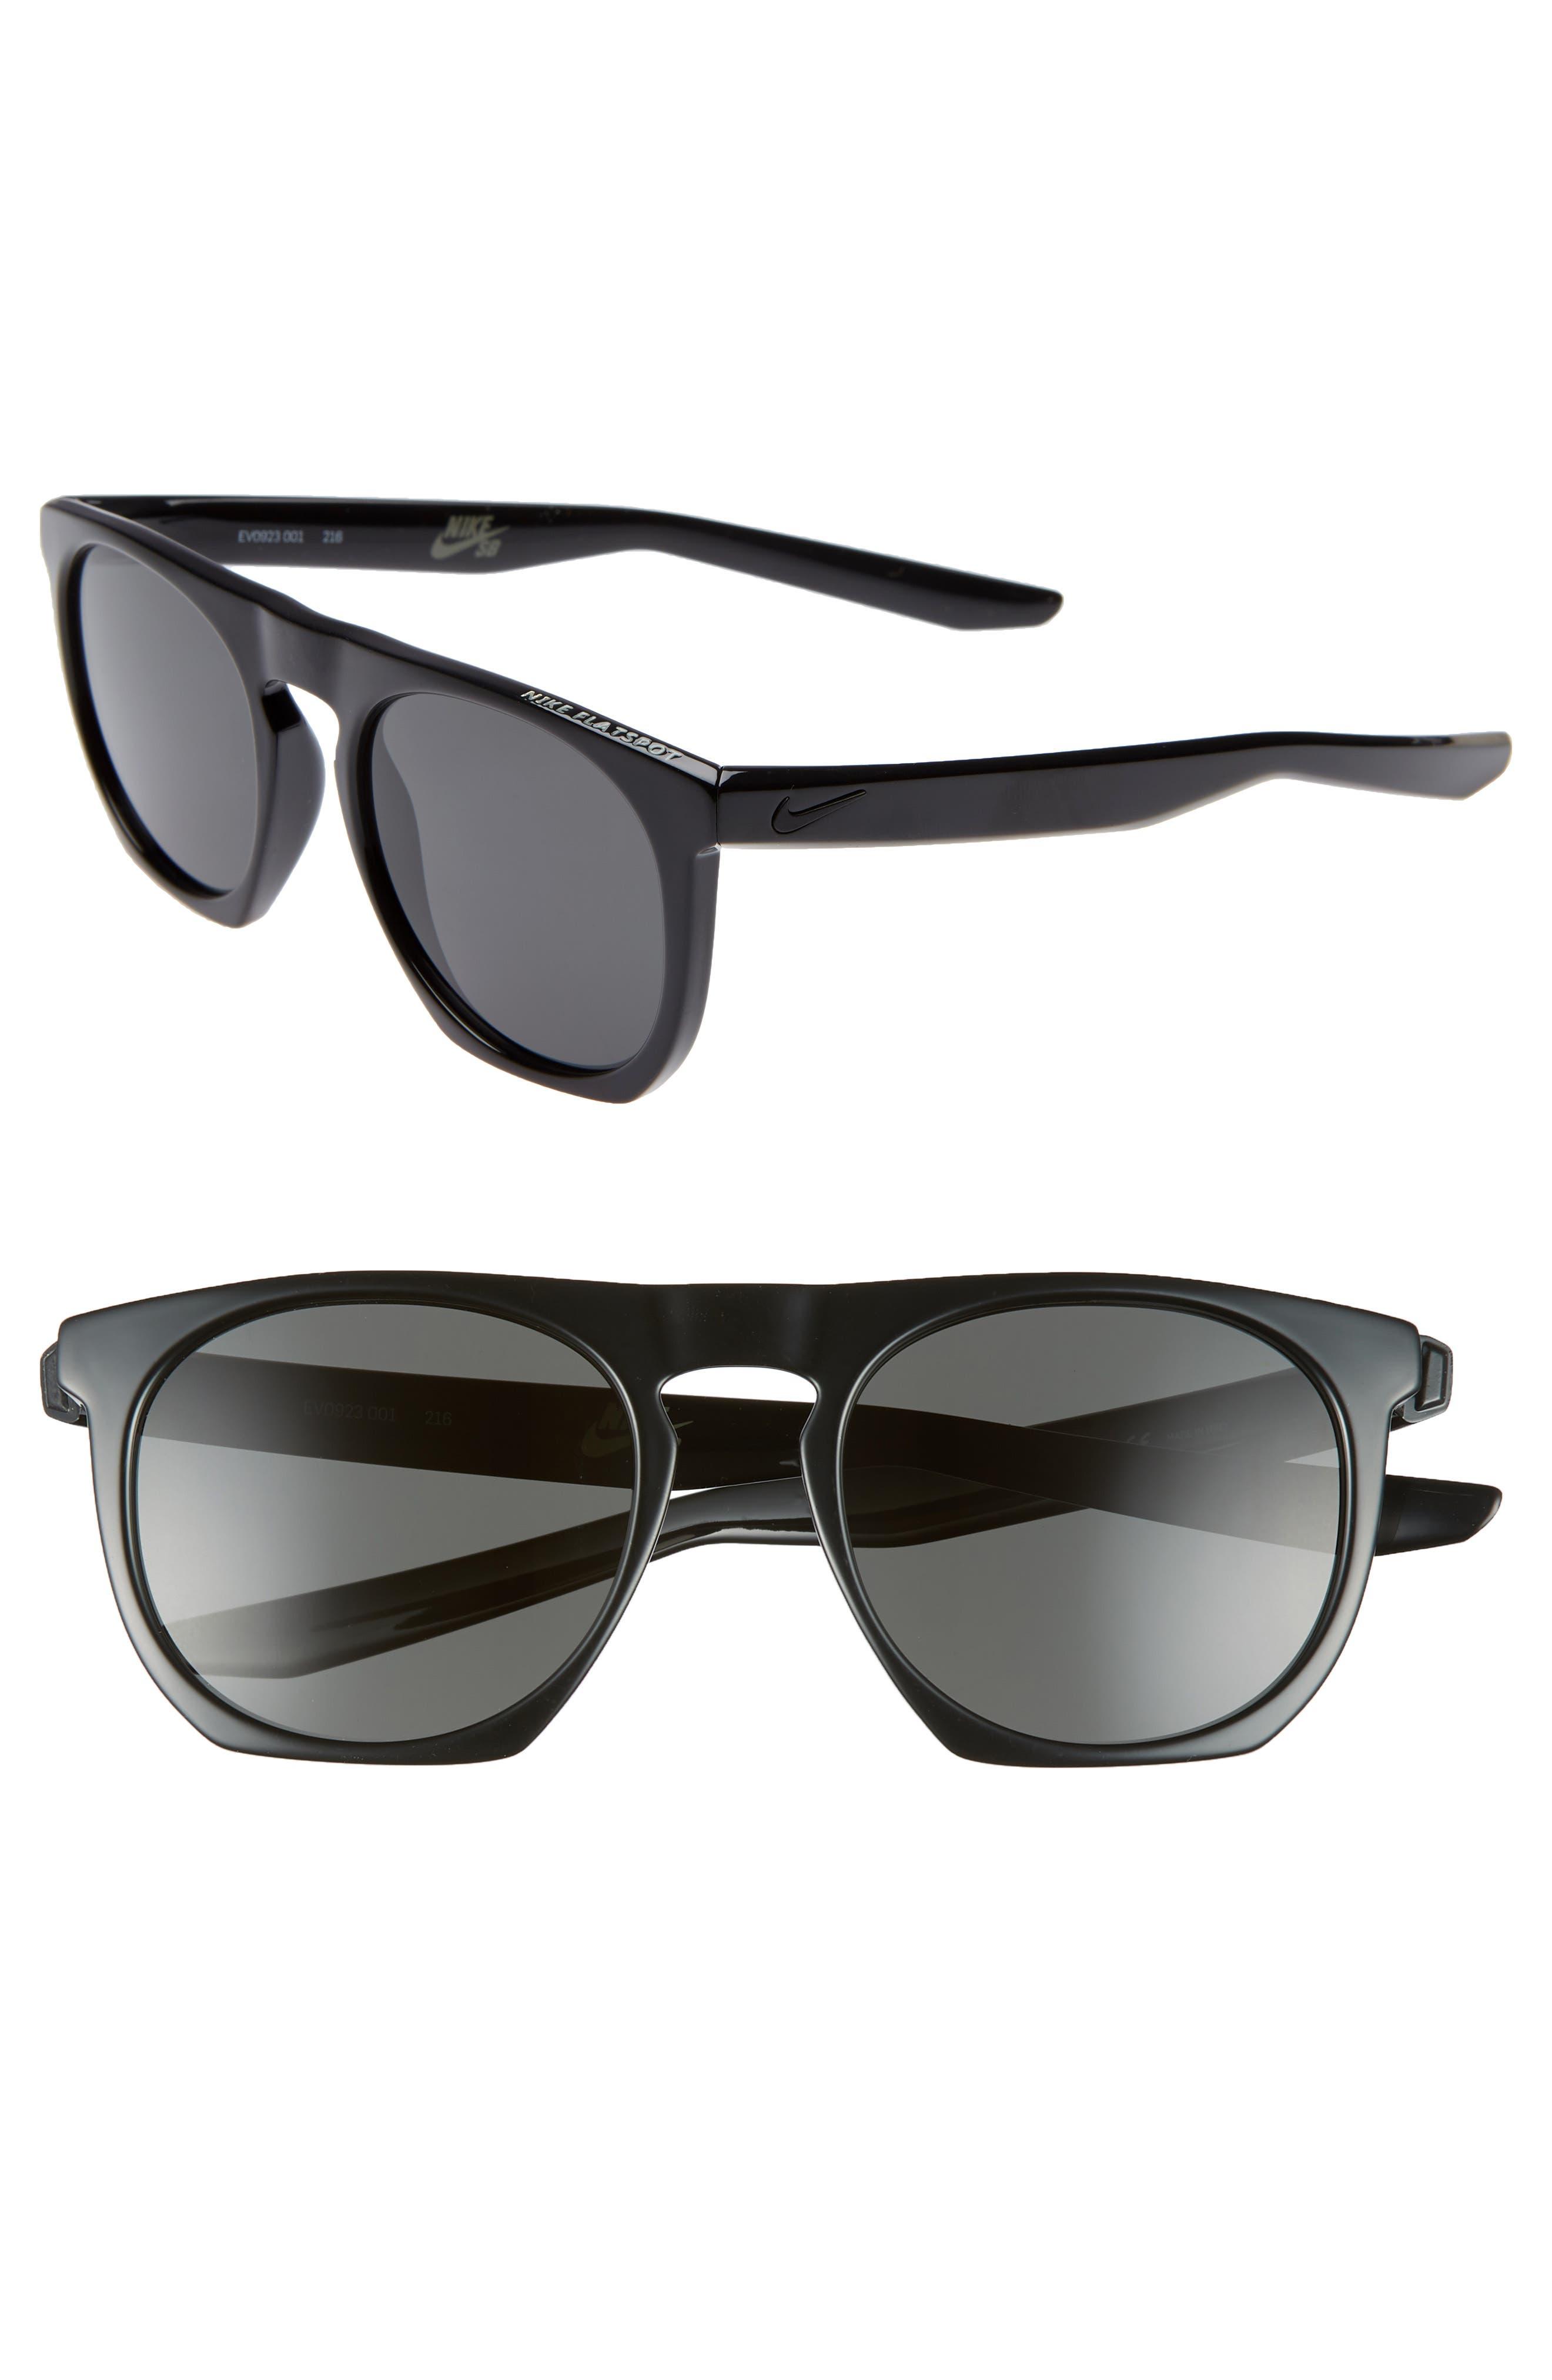 063e2872c0e Nike Sunglasses for Women